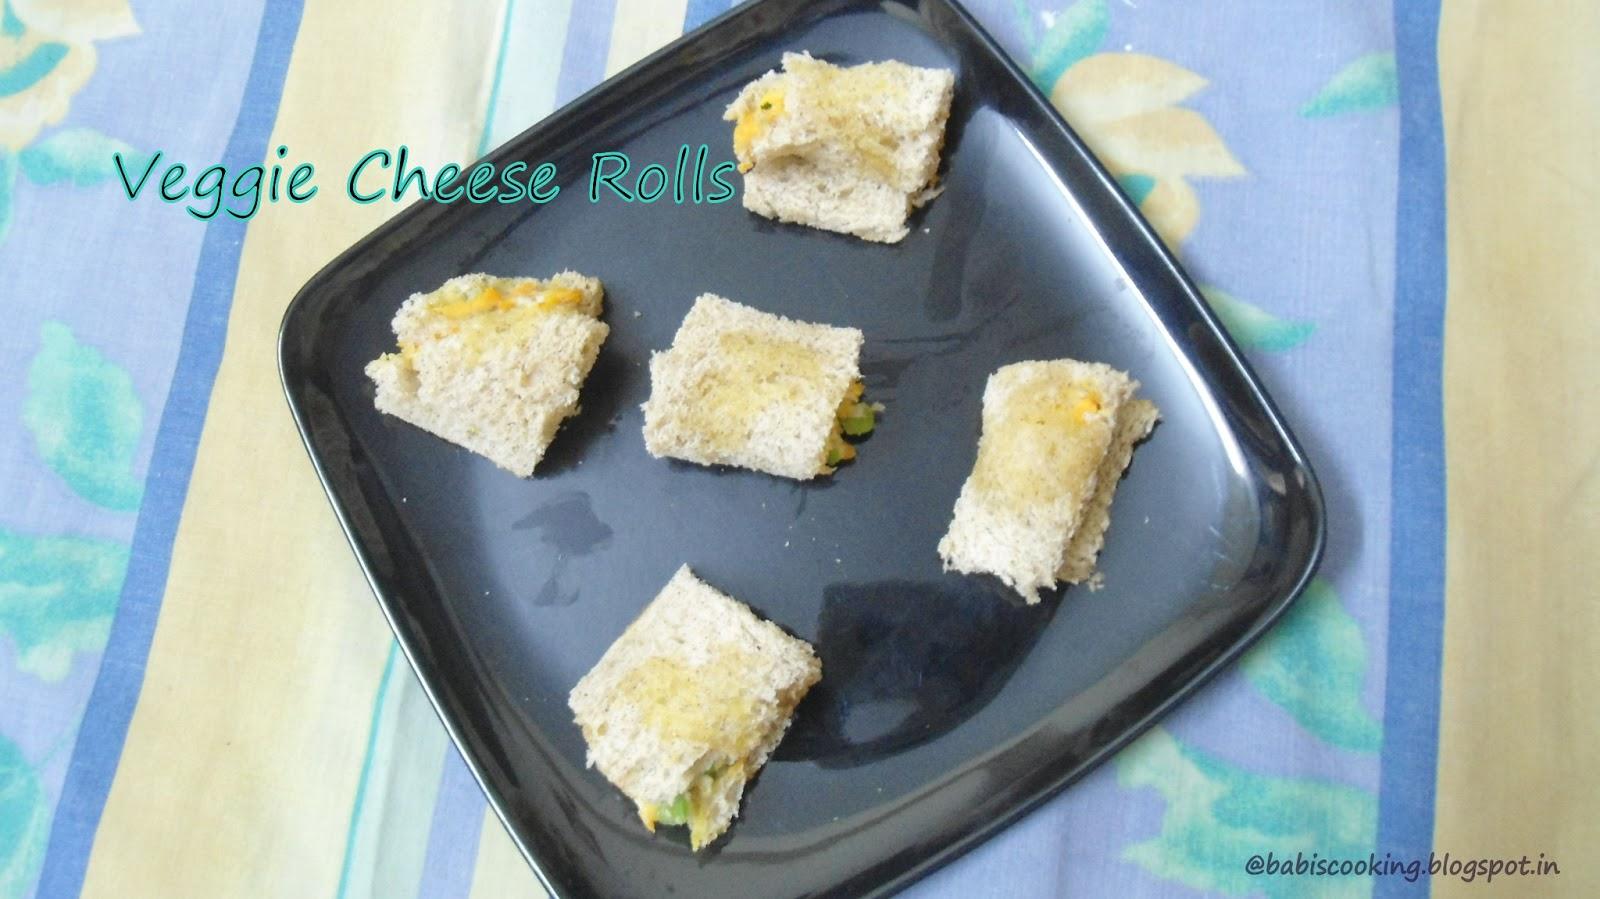 Veggie cheese rolls